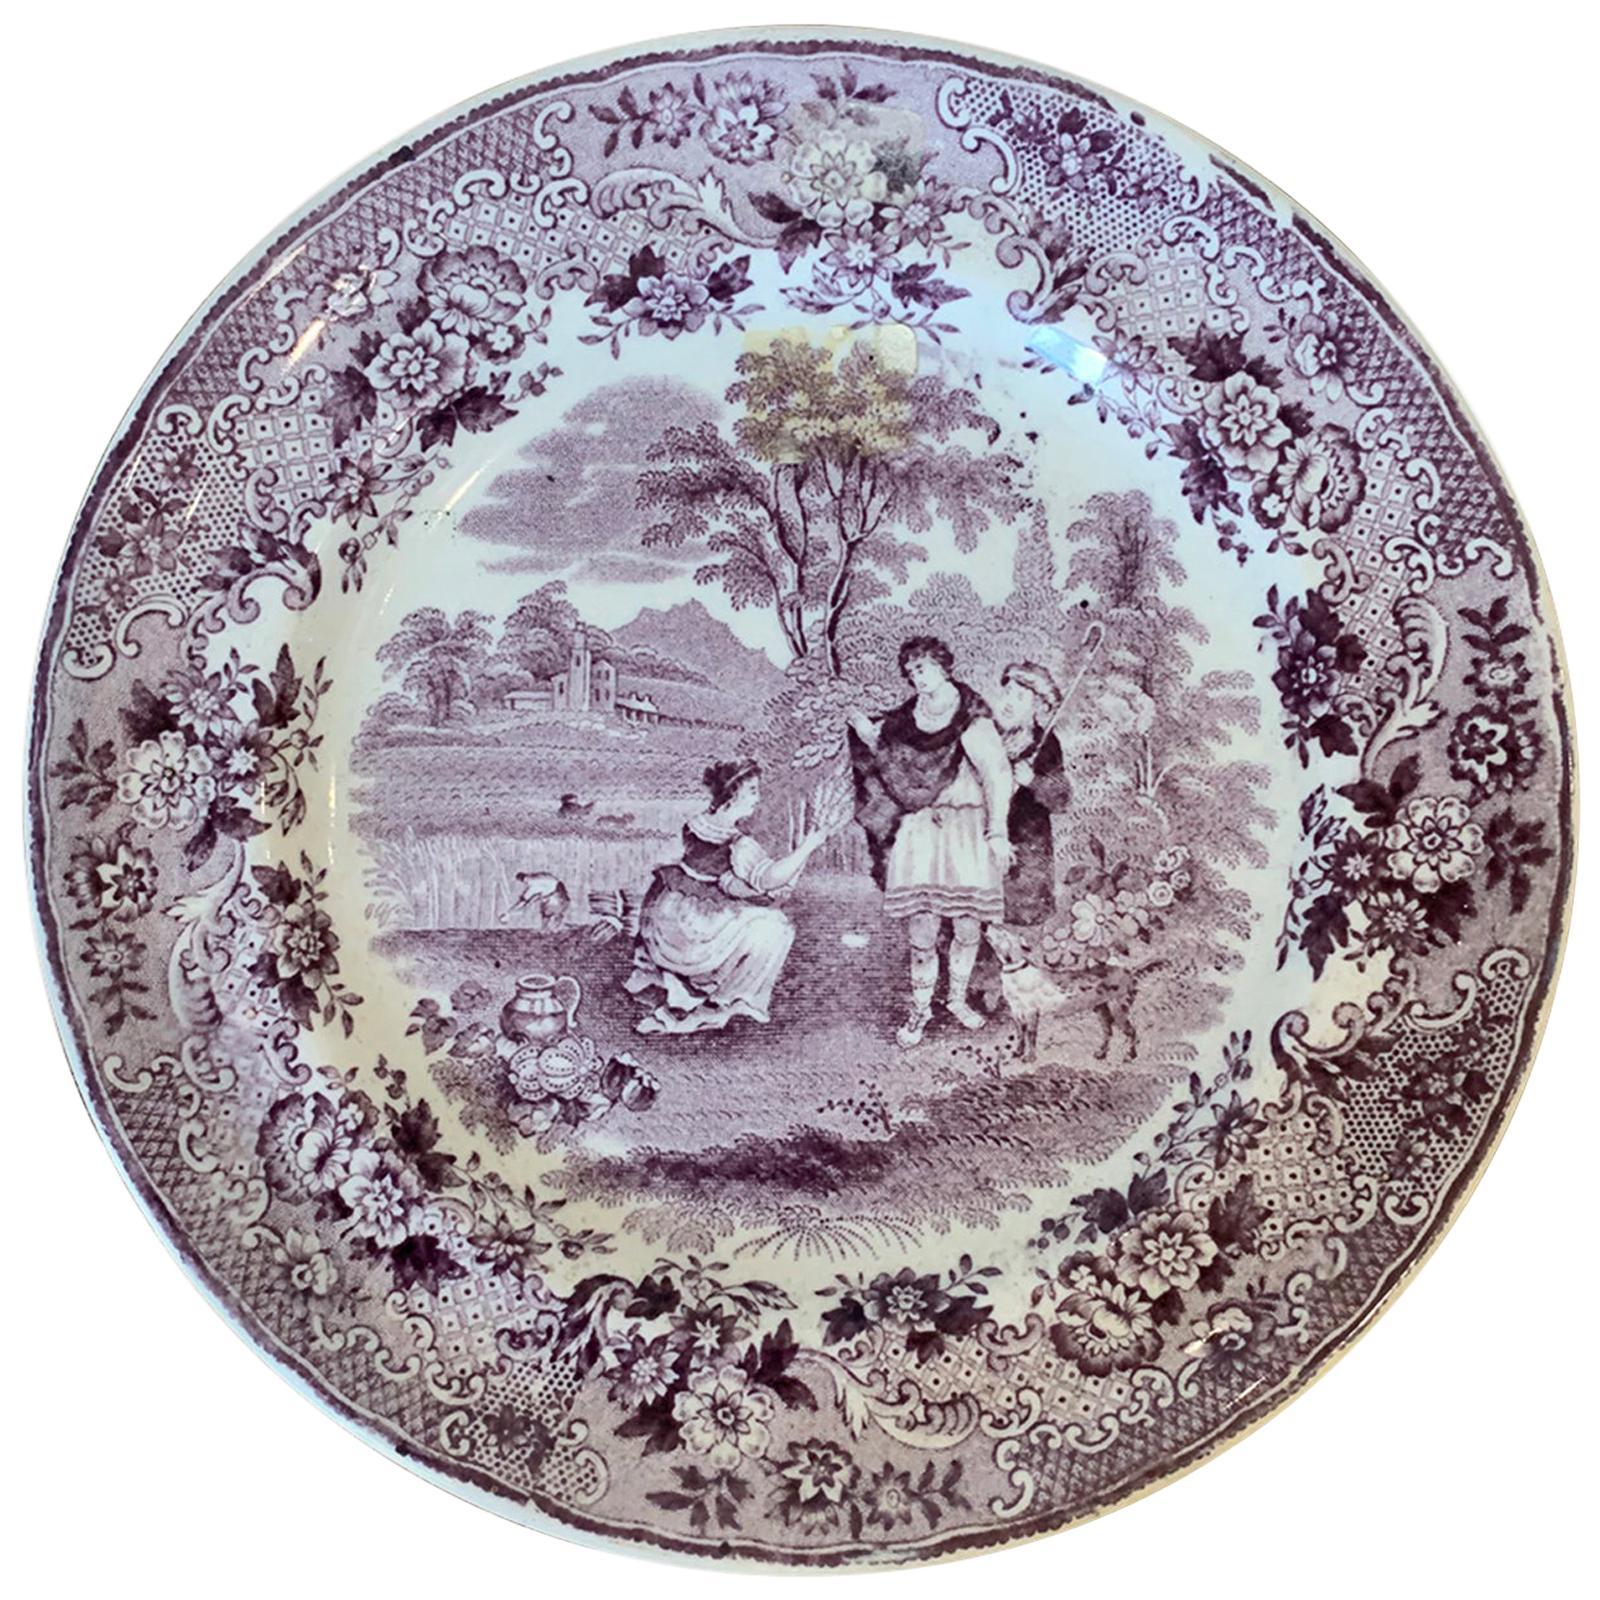 Dutch Transferware Plate in Ruth Boas Pattern by Petrus Regout & Co. circa 1880s